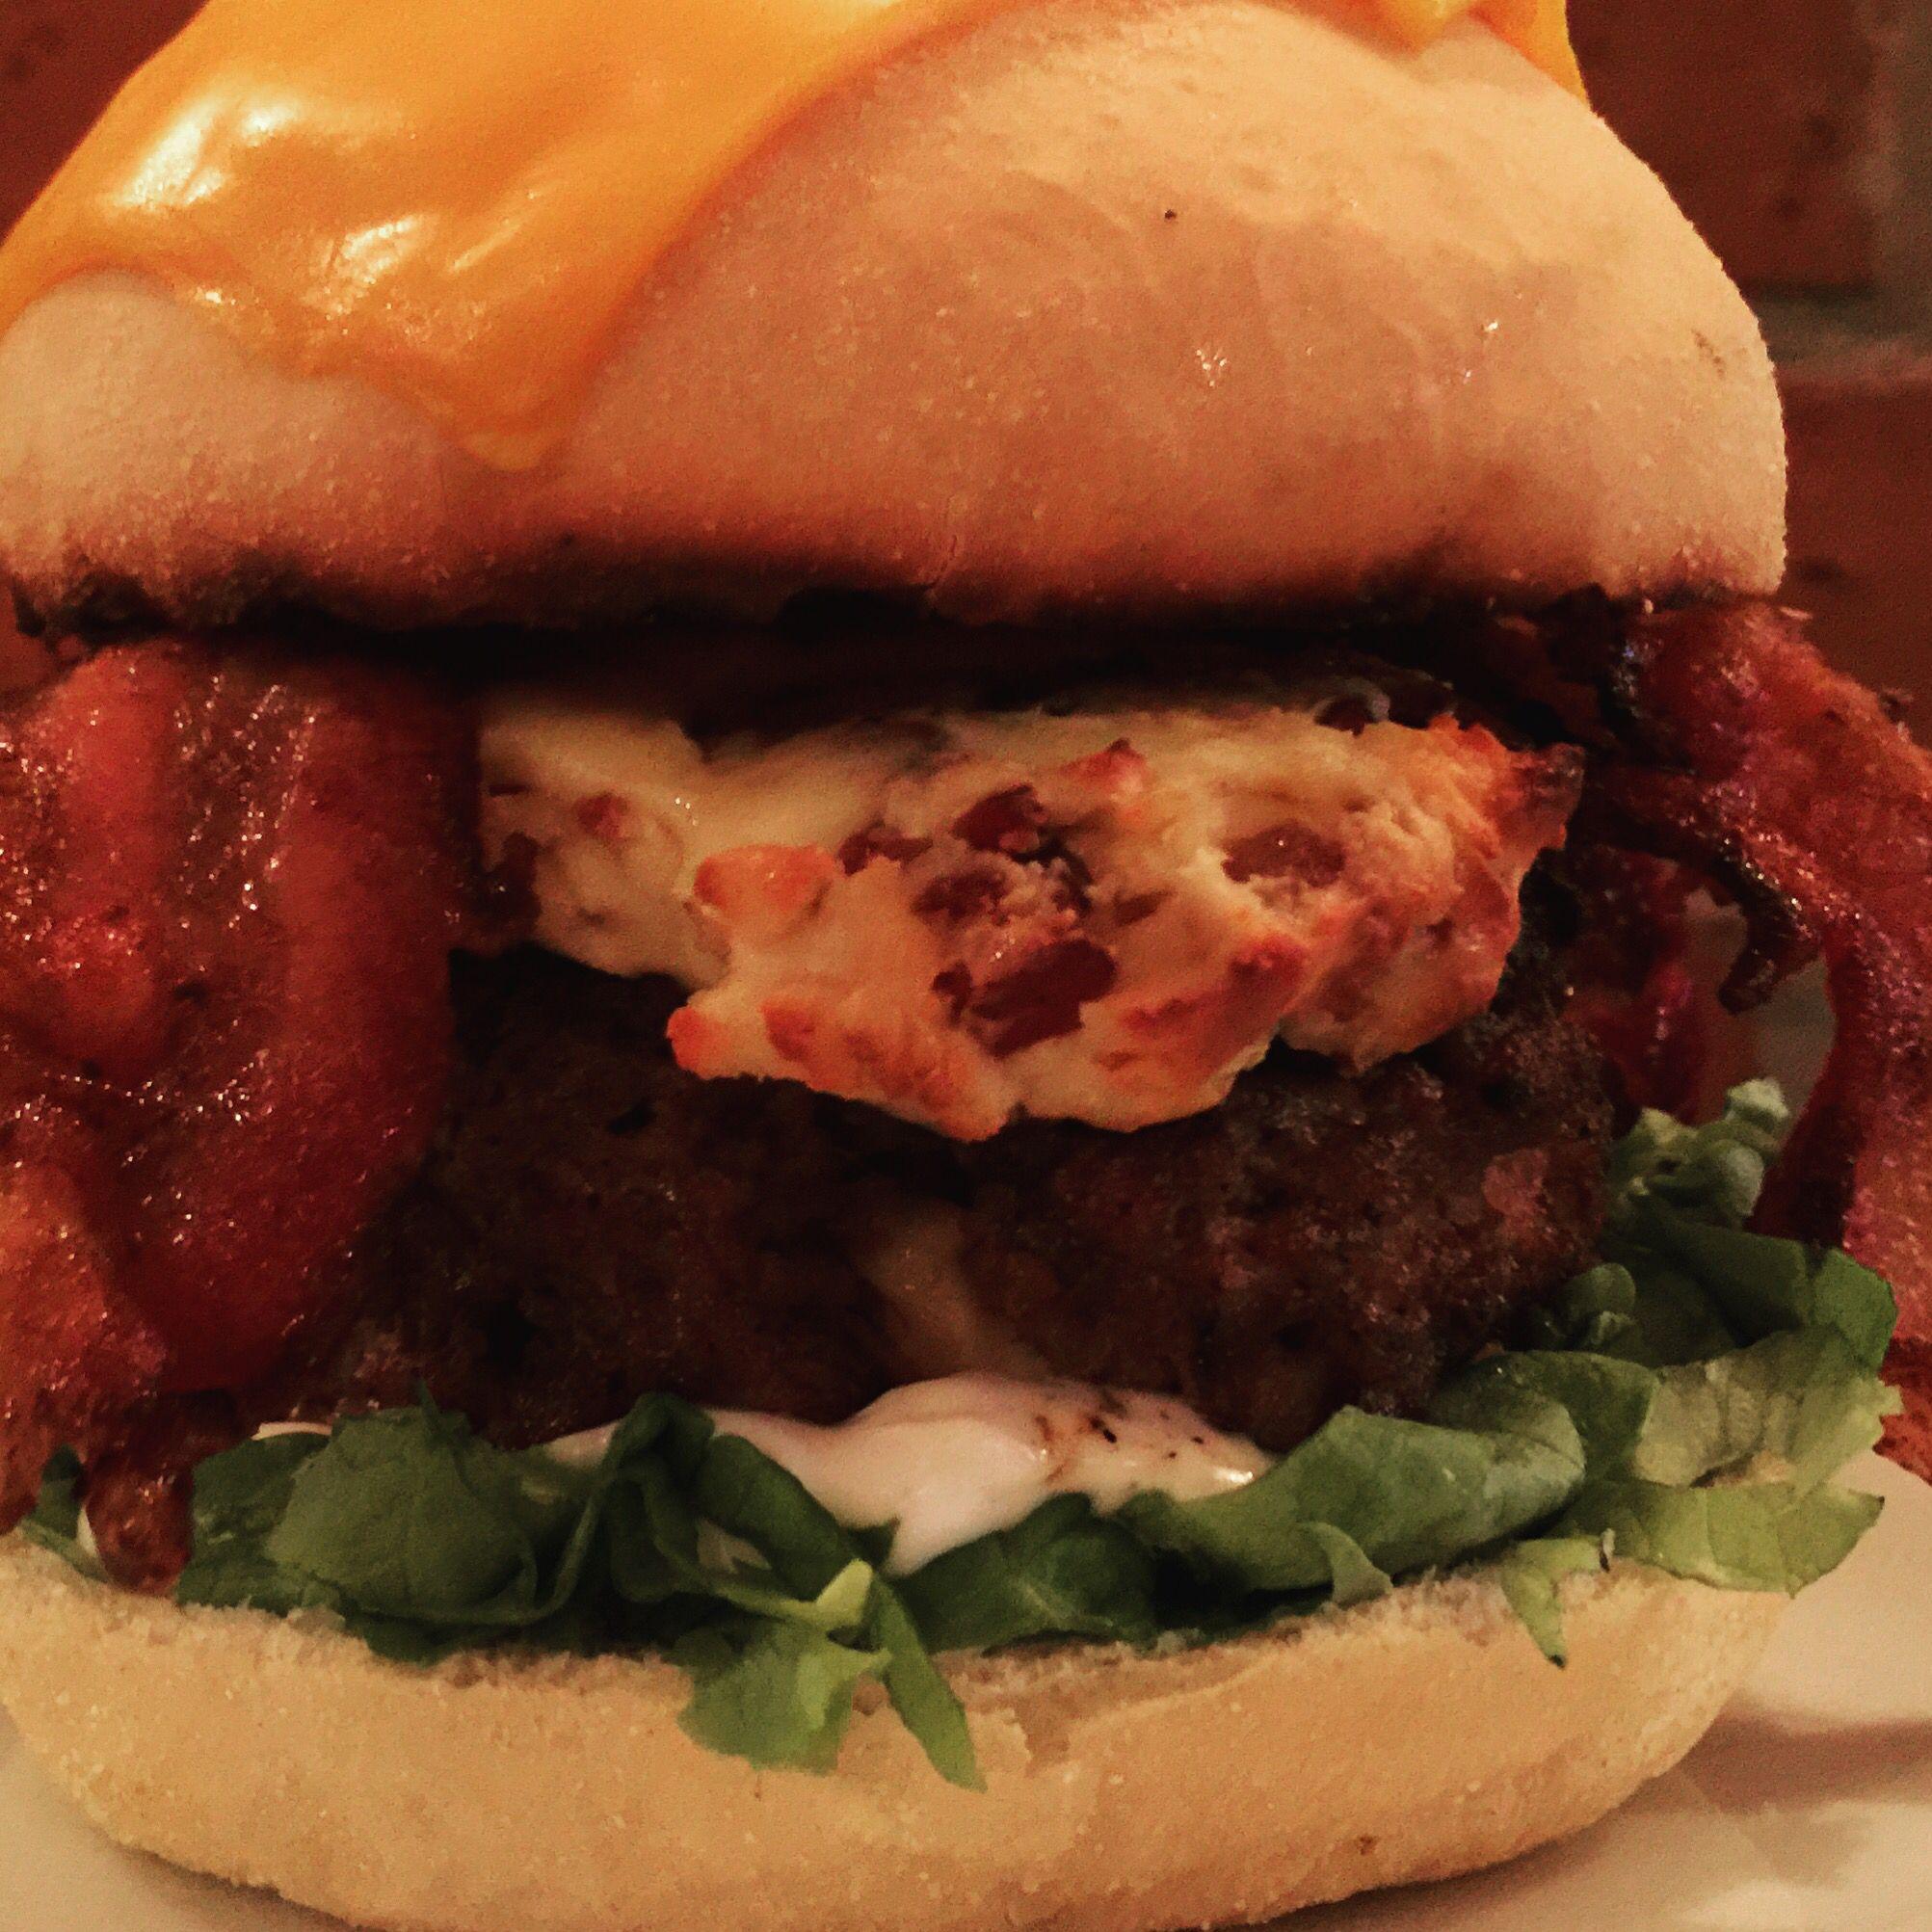 Alface, maionese de oliva, Burger blend de entrecot e costela recheado com mussarela cremosa, mussarela cremosa com crispy de bacon e bacon na manteiga com molho worcestershire.  #agentenãocopia #burgerlover #foodporn #instaburger #burgerporn